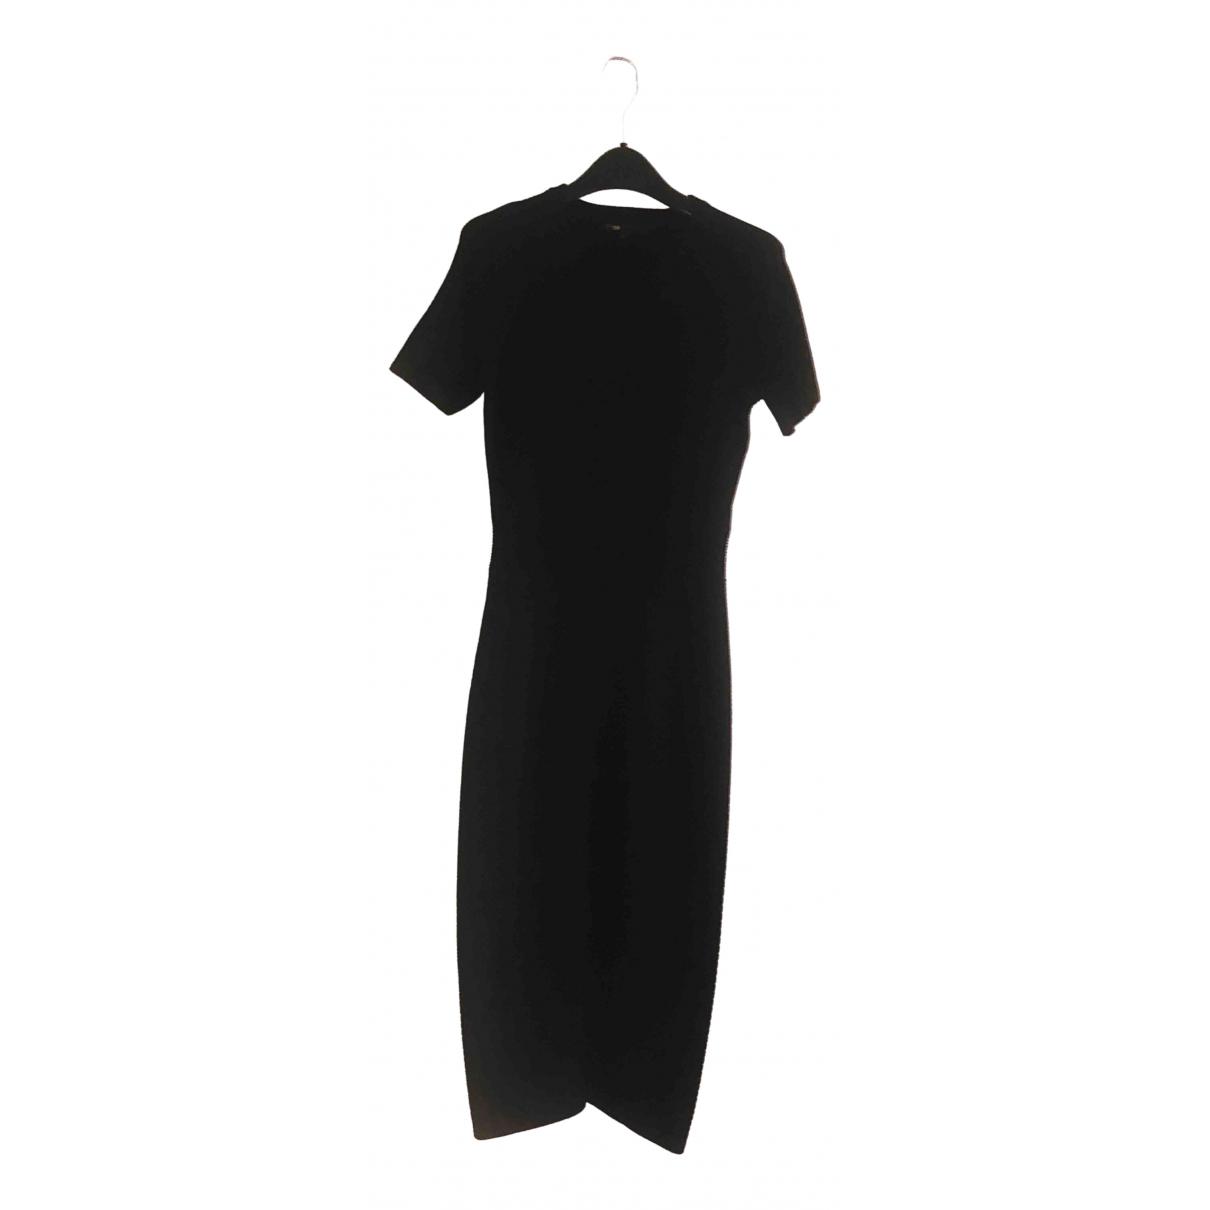 Maje Fall Winter 2019 Black dress for Women 1 0-5